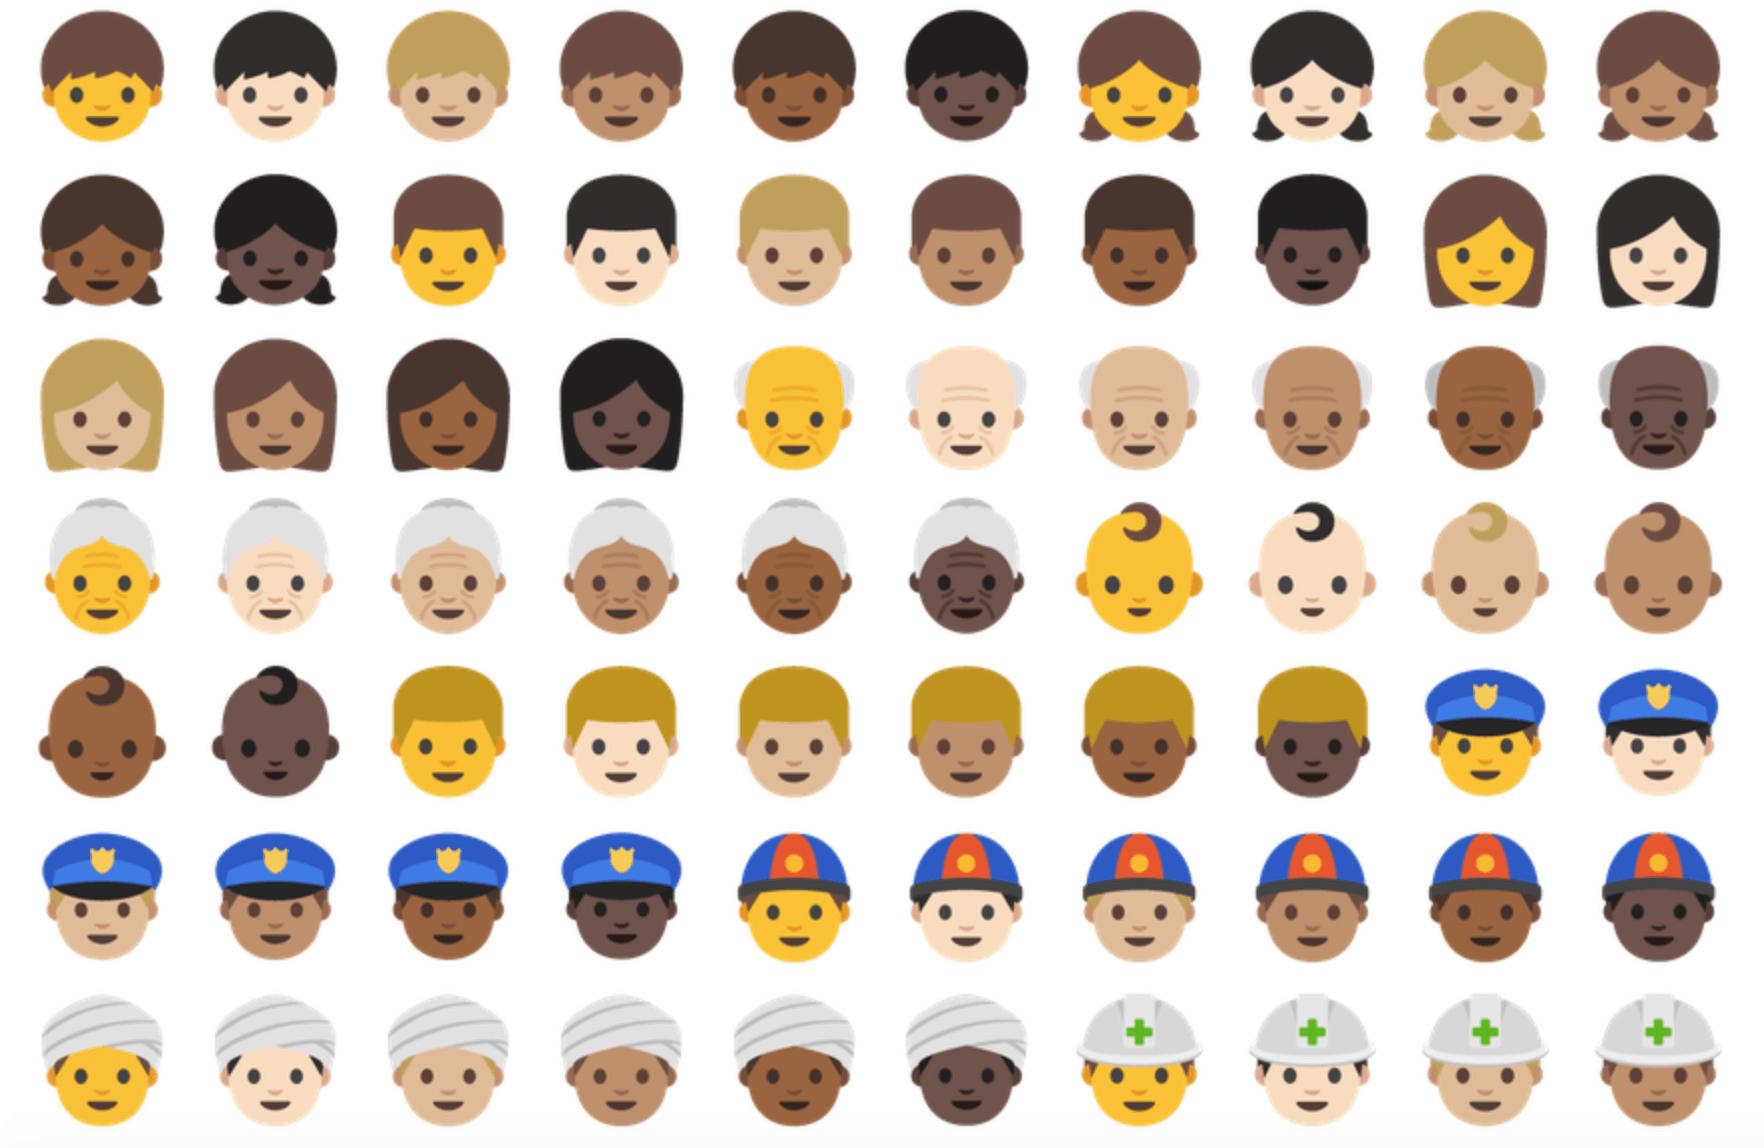 emoji unicode 9 - modifikátor barvy pleti